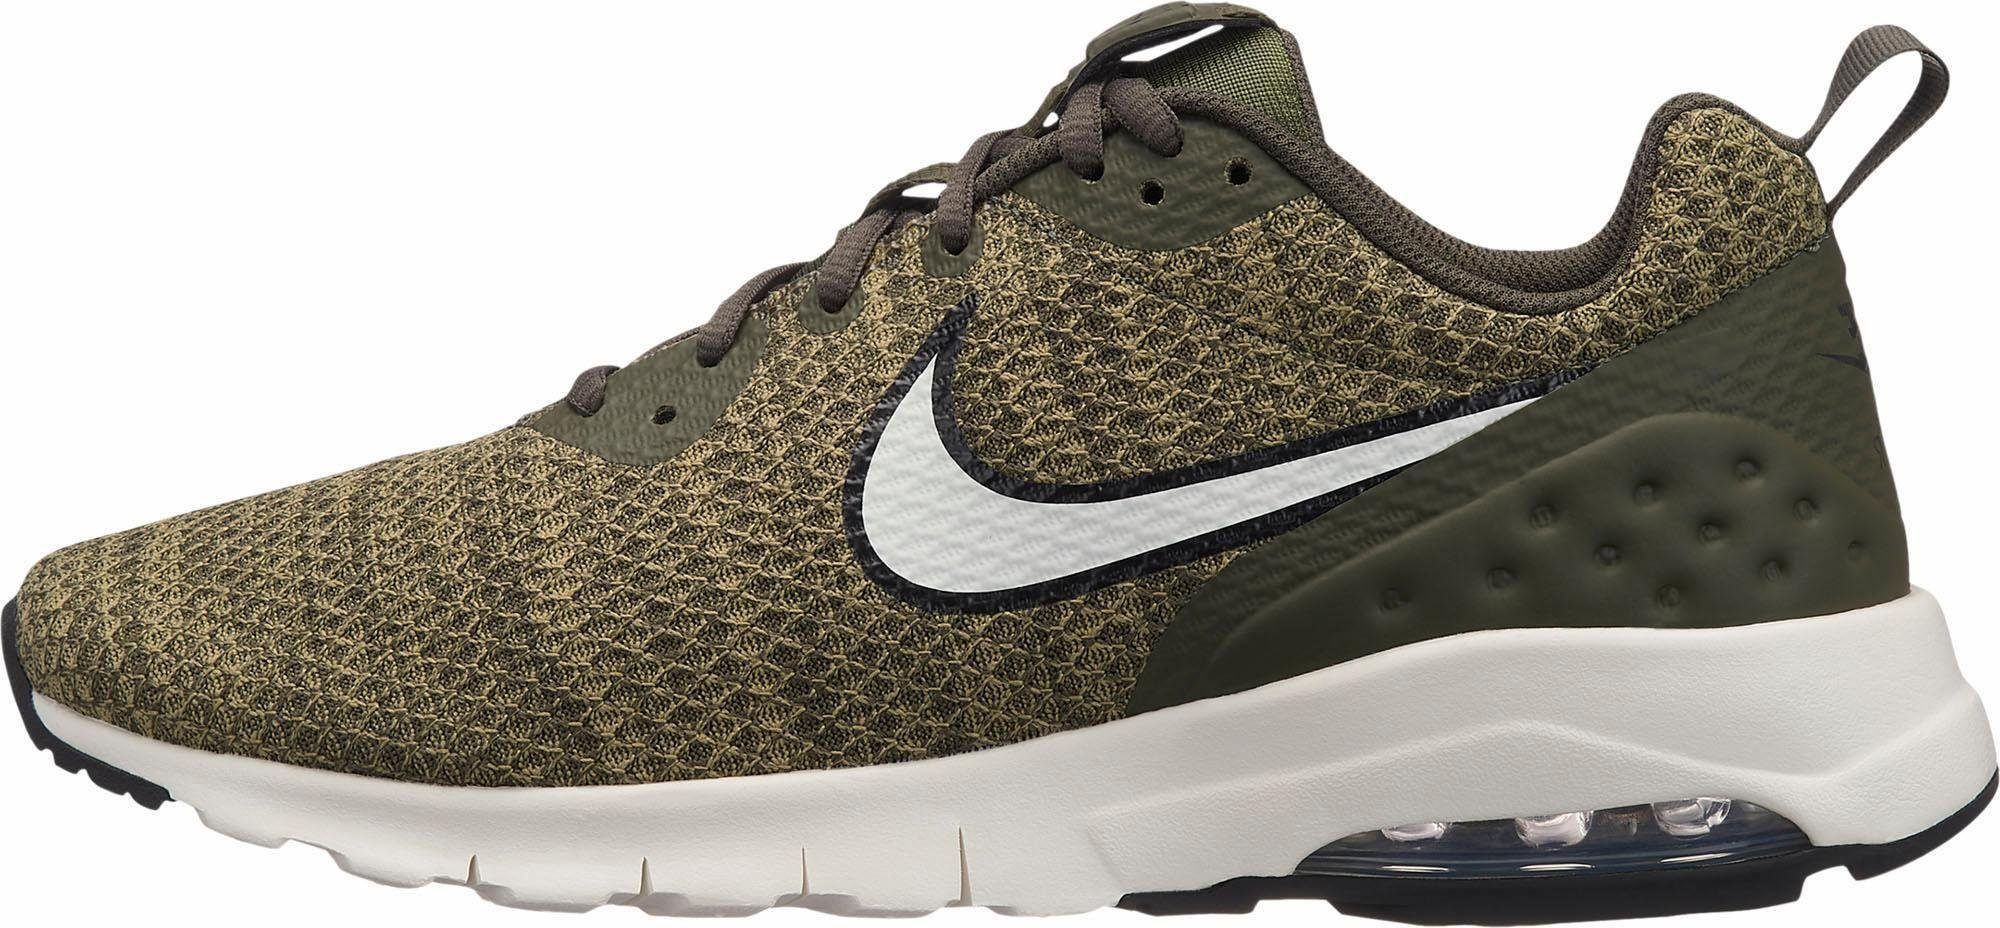 Nike Sportswear Air Max Motion LW LE Sneaker  olivgrün